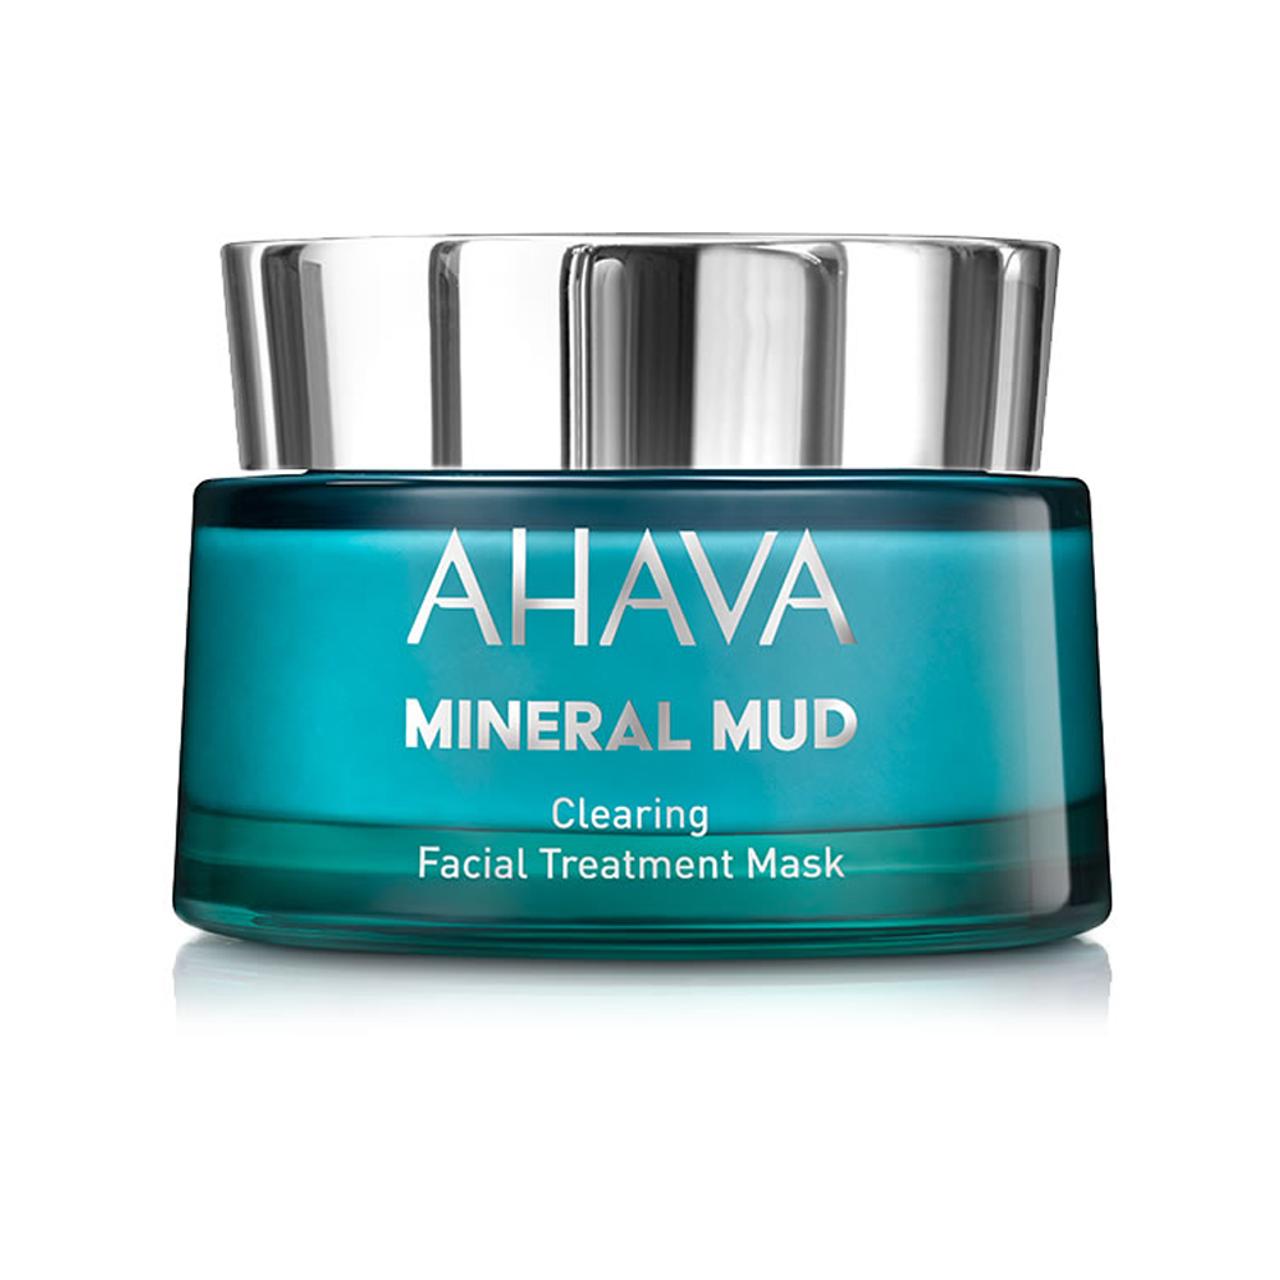 AHAVA Clearing Facial Treatment Mask